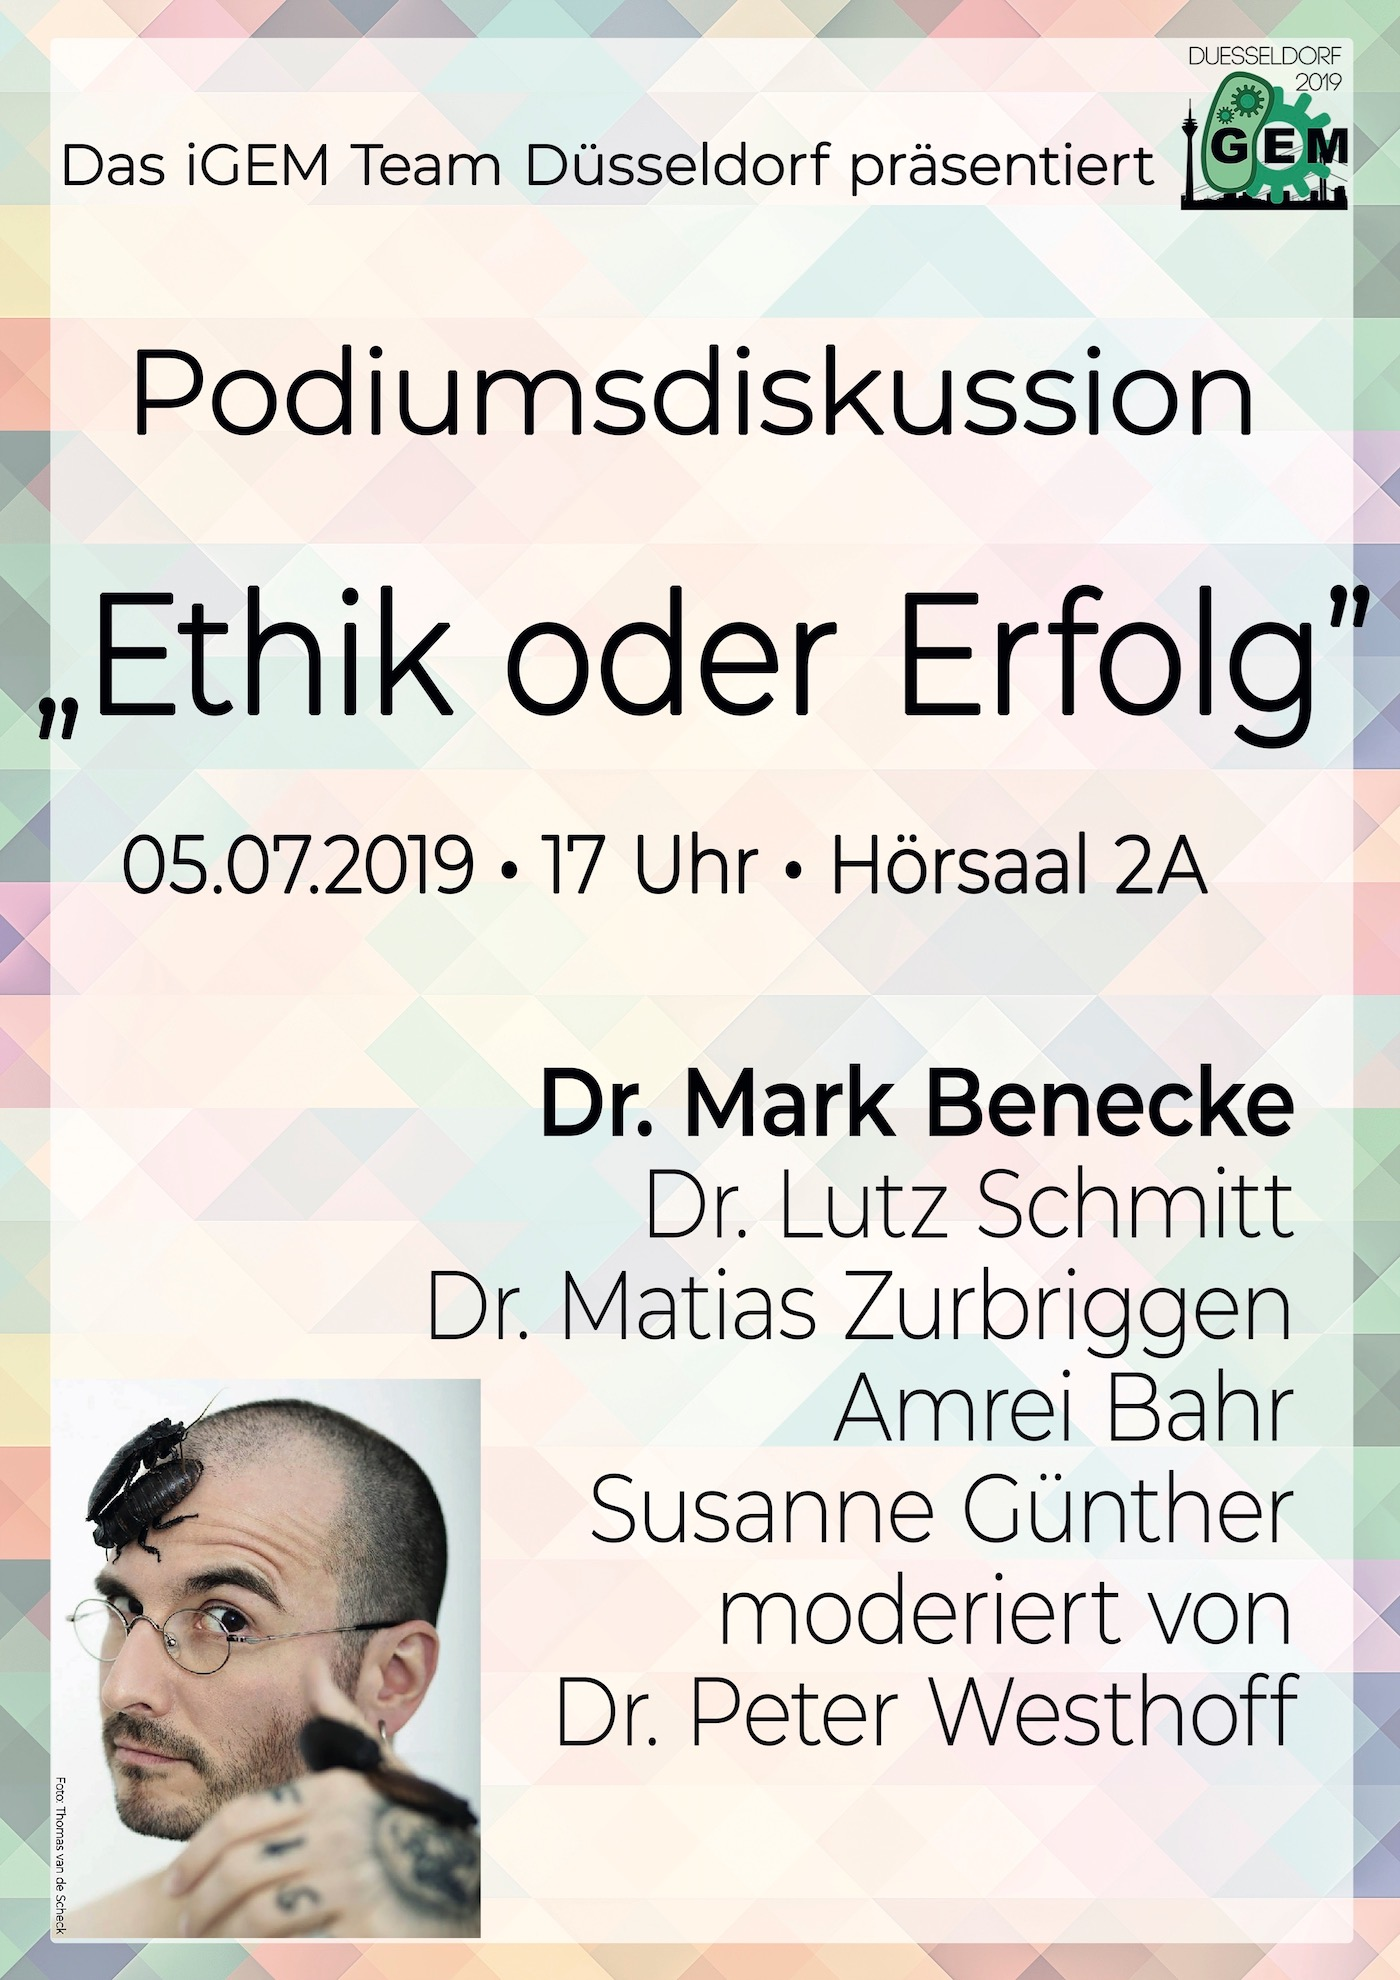 a_mark_benecke_igem_duesseldorf_2018_2019_molecular_synthetic_biology - 28.jpg